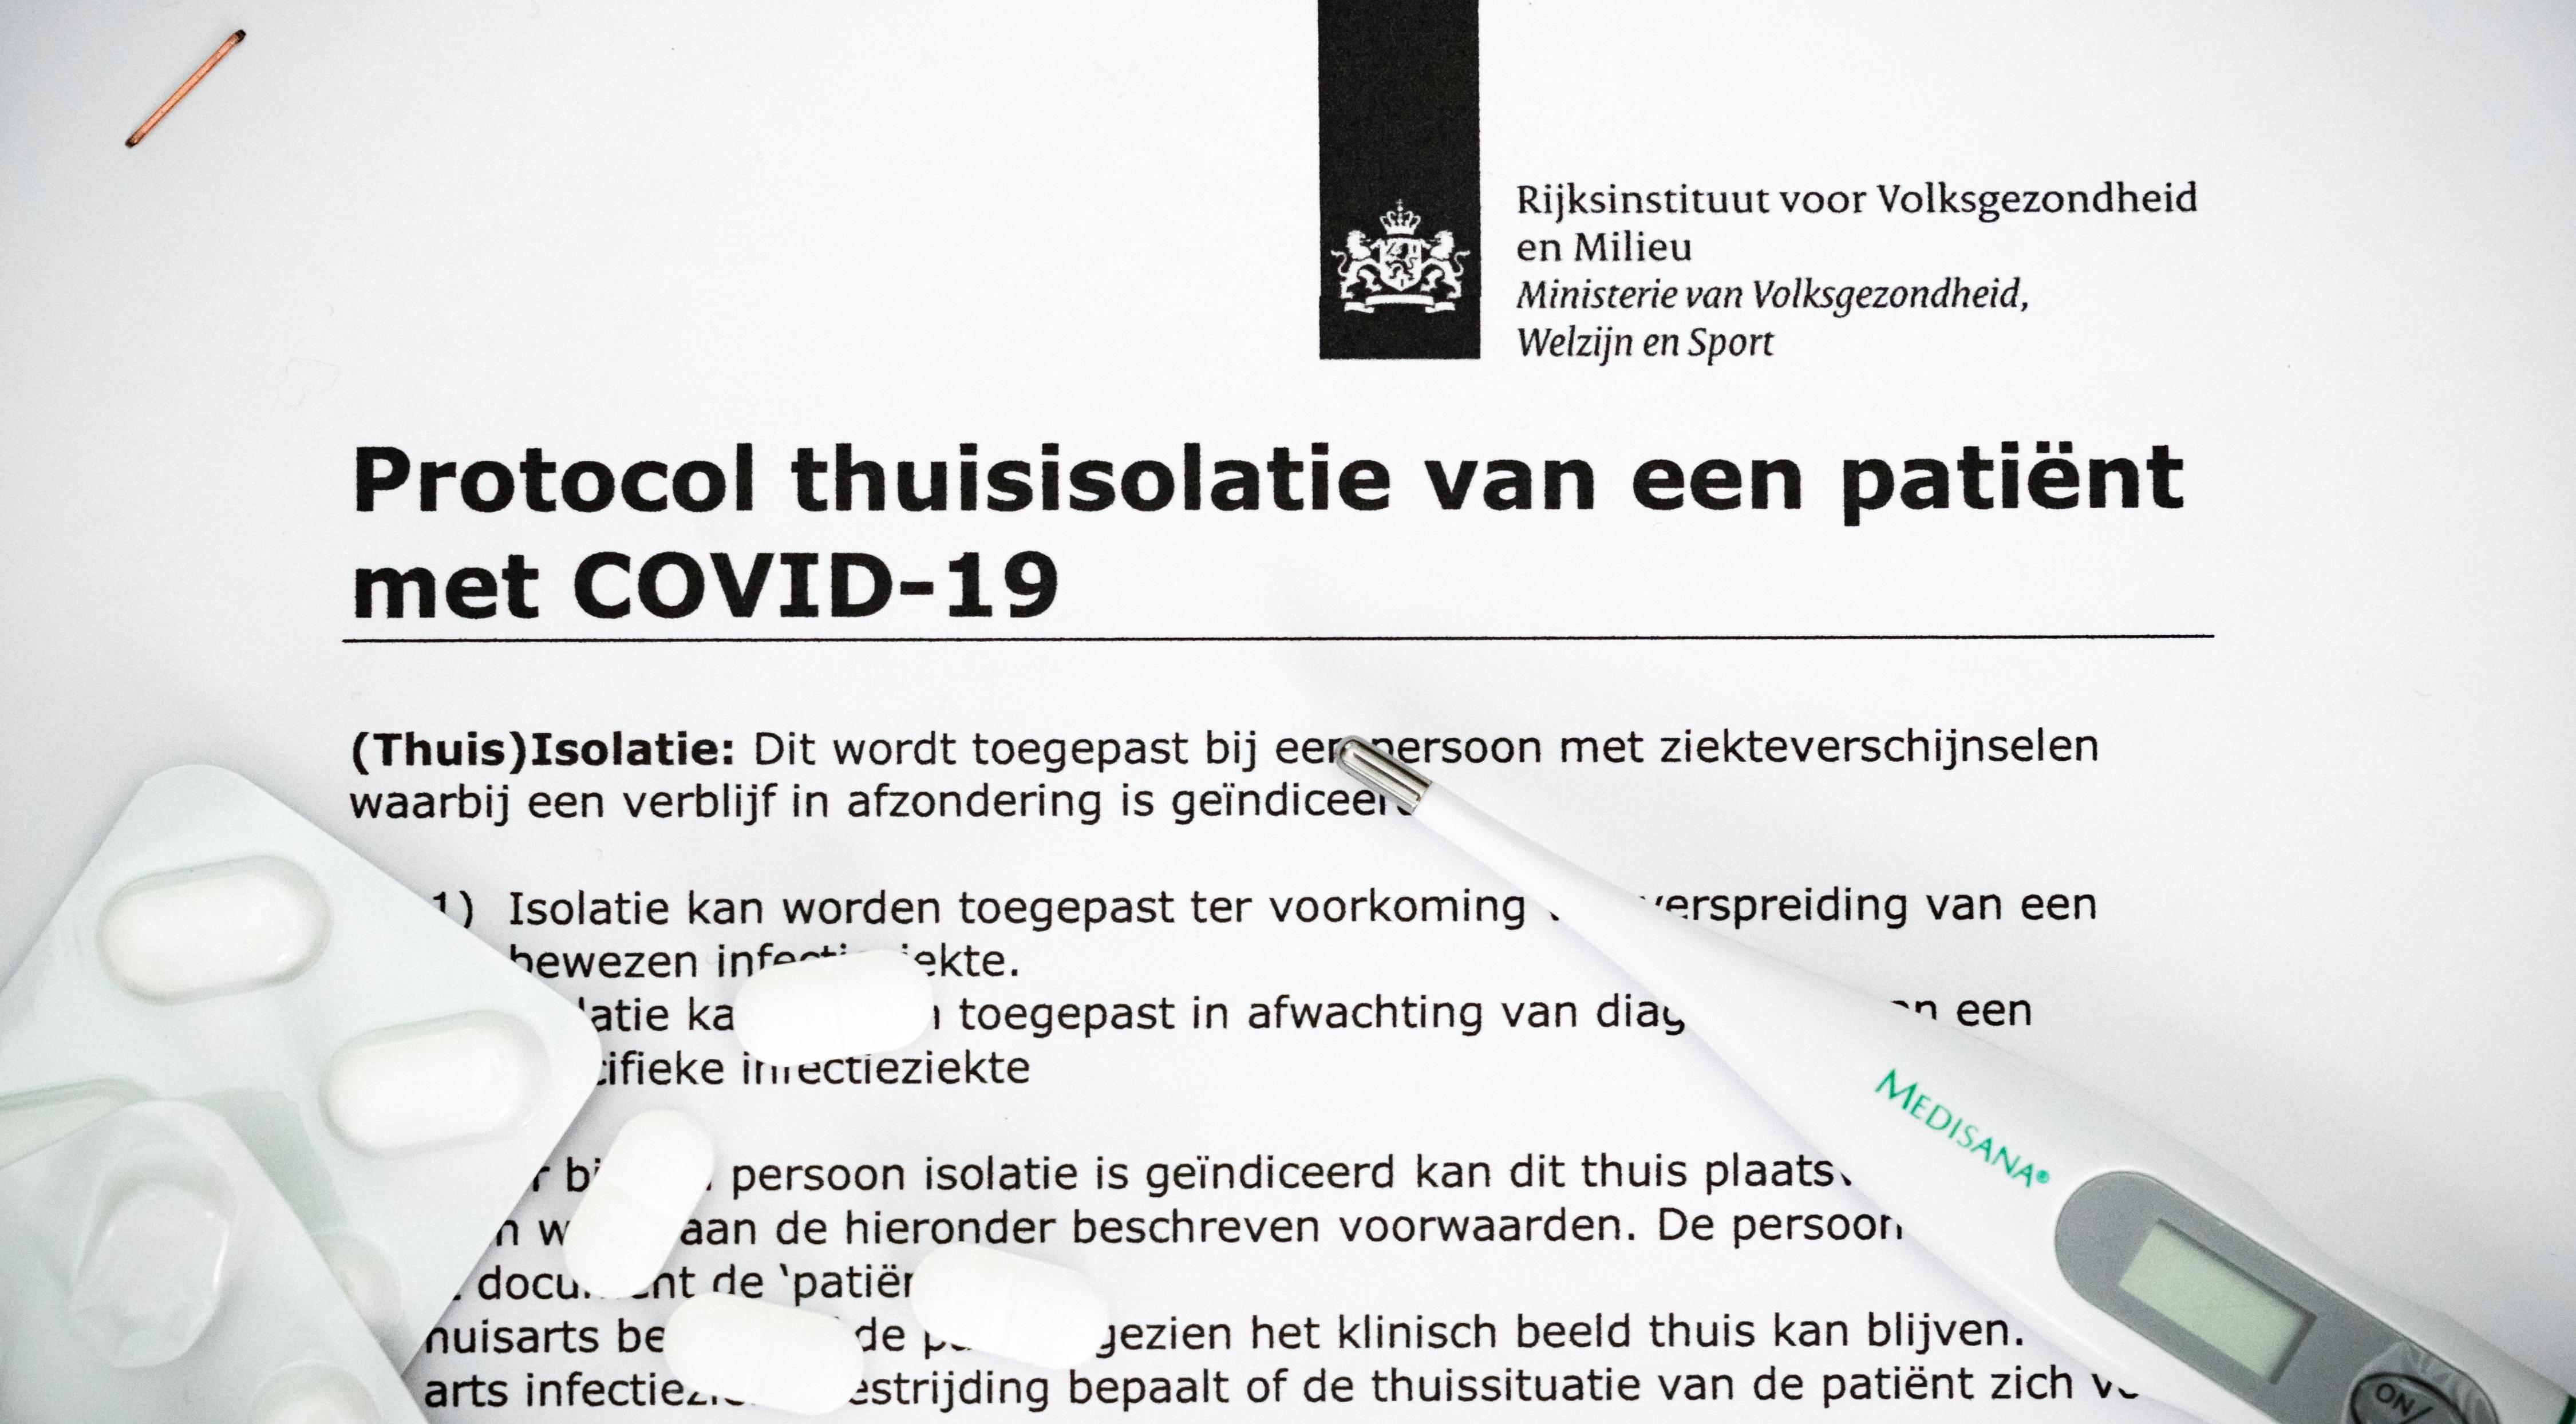 128 nieuwe coronabesmettingen in West-Friesland